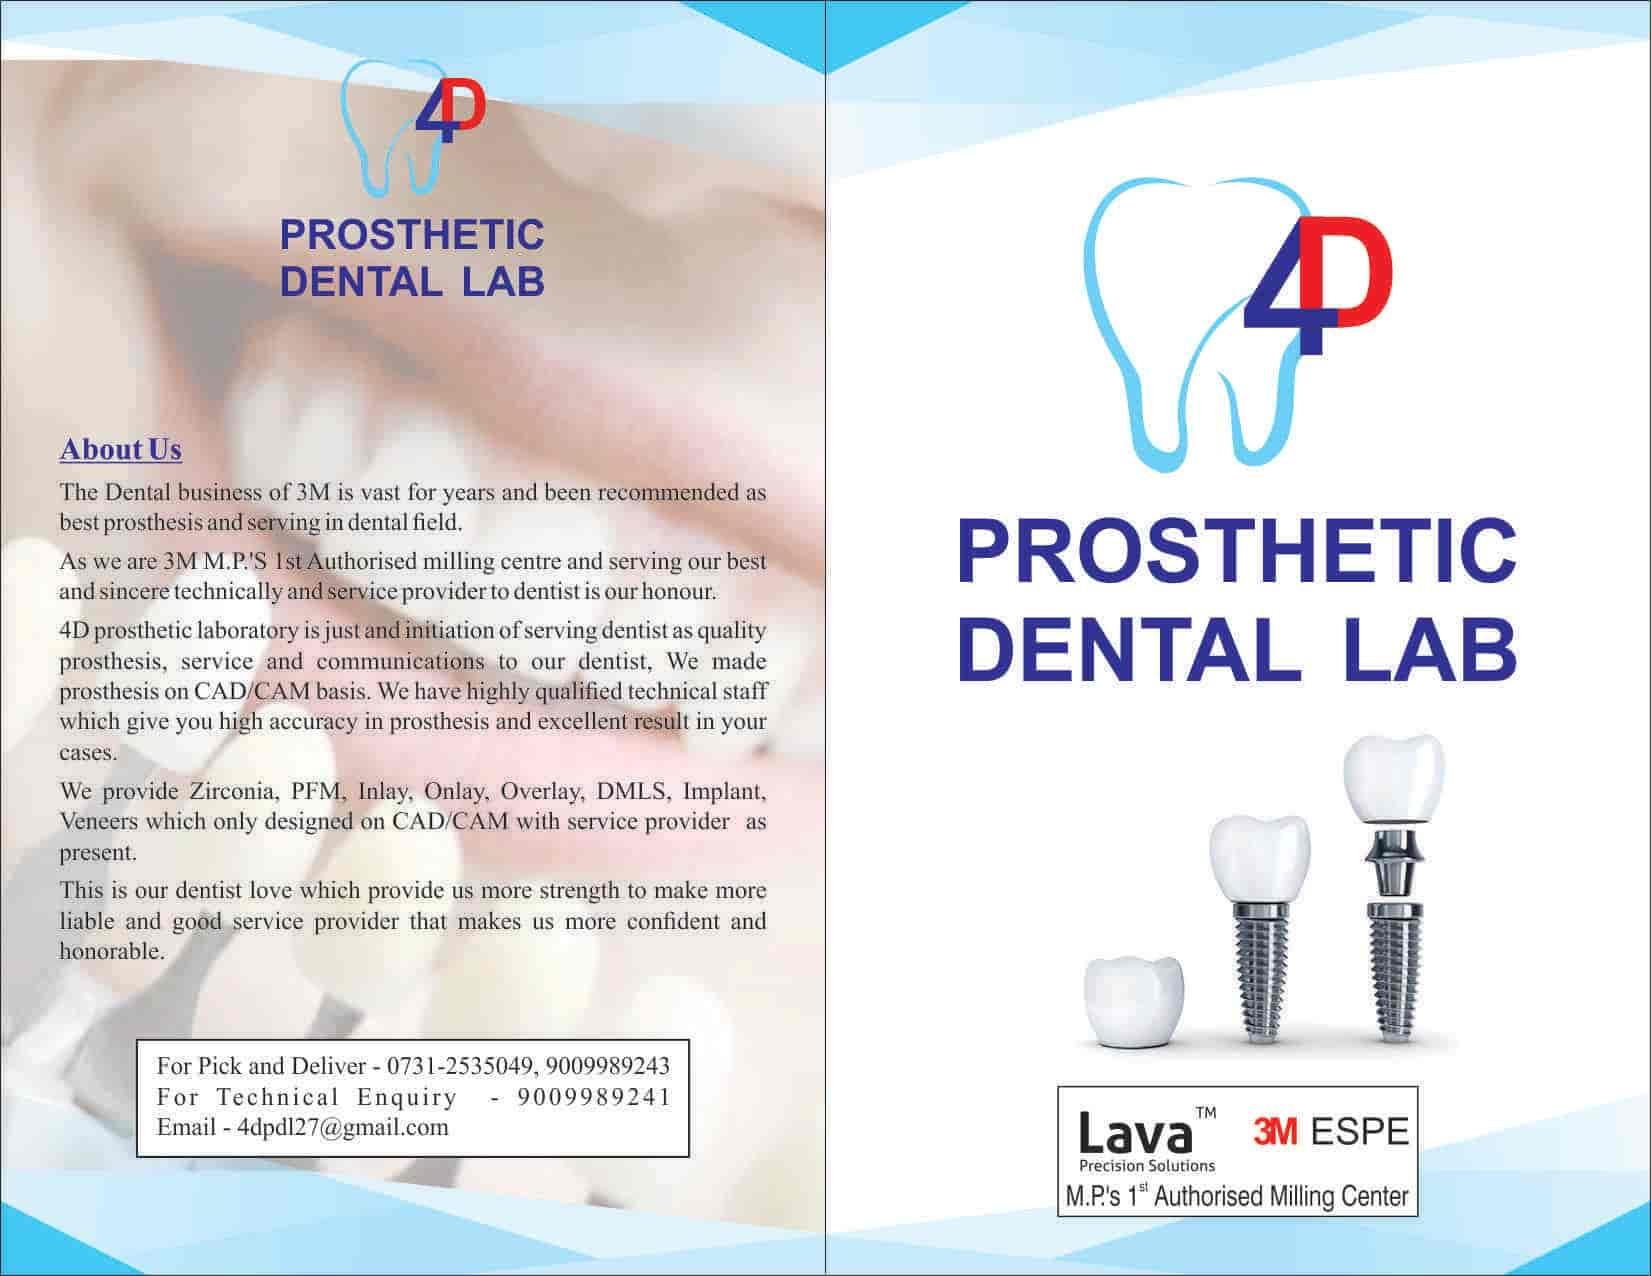 4d Prosthetic Dental Lab Indore Mp Photos, Rajwada, Indore